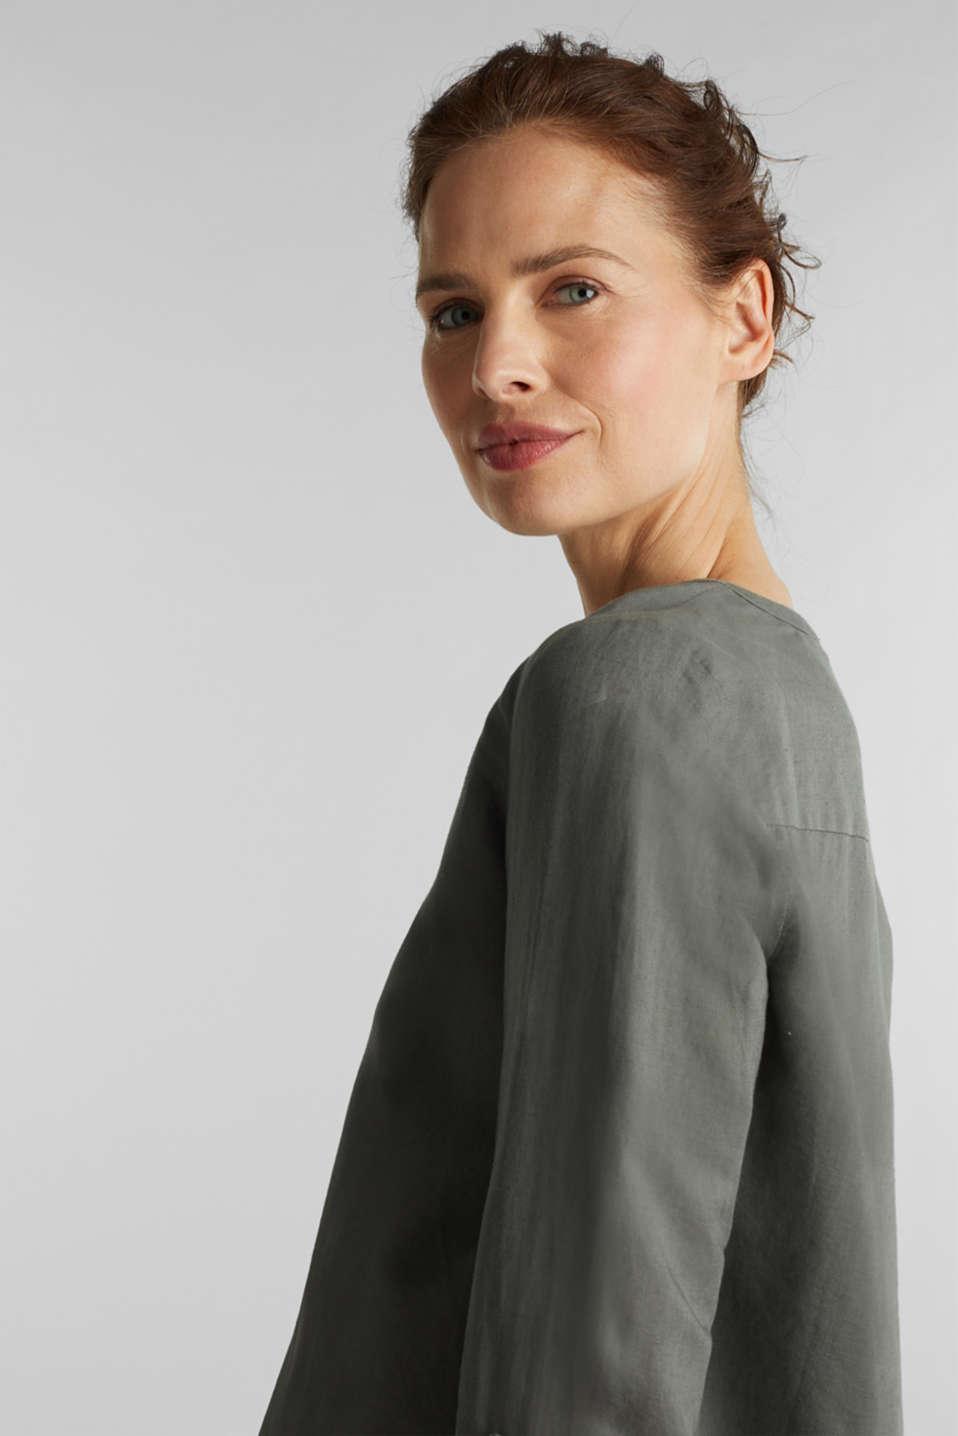 Turn-up blouse in blended linen, KHAKI GREEN, detail image number 6